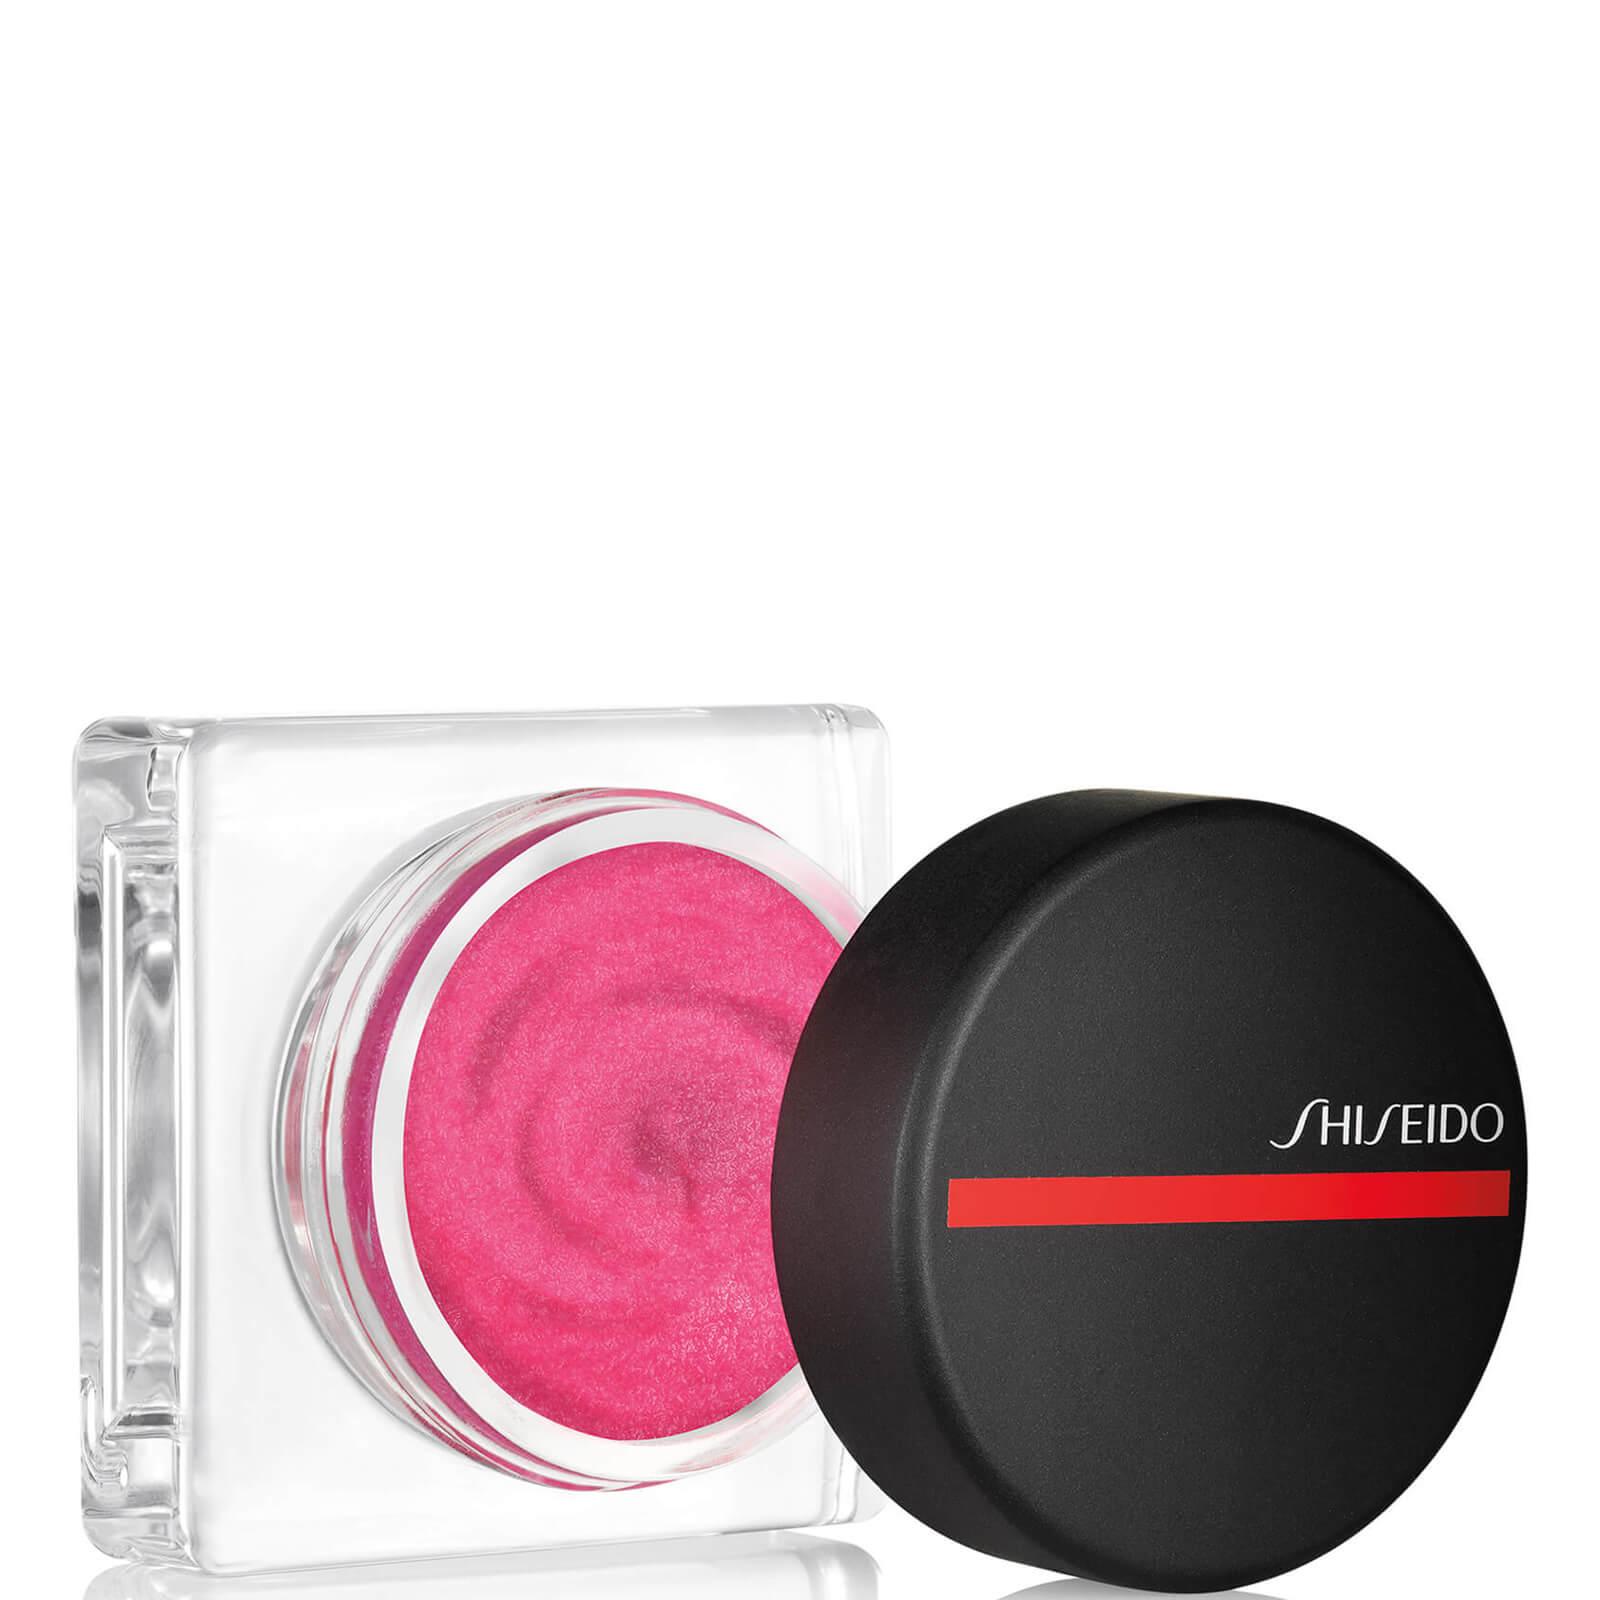 Купить Румяна-вуаль Shiseido Minimalist Whipped Powder Blush (различные оттенки) - Blush Kokei 08